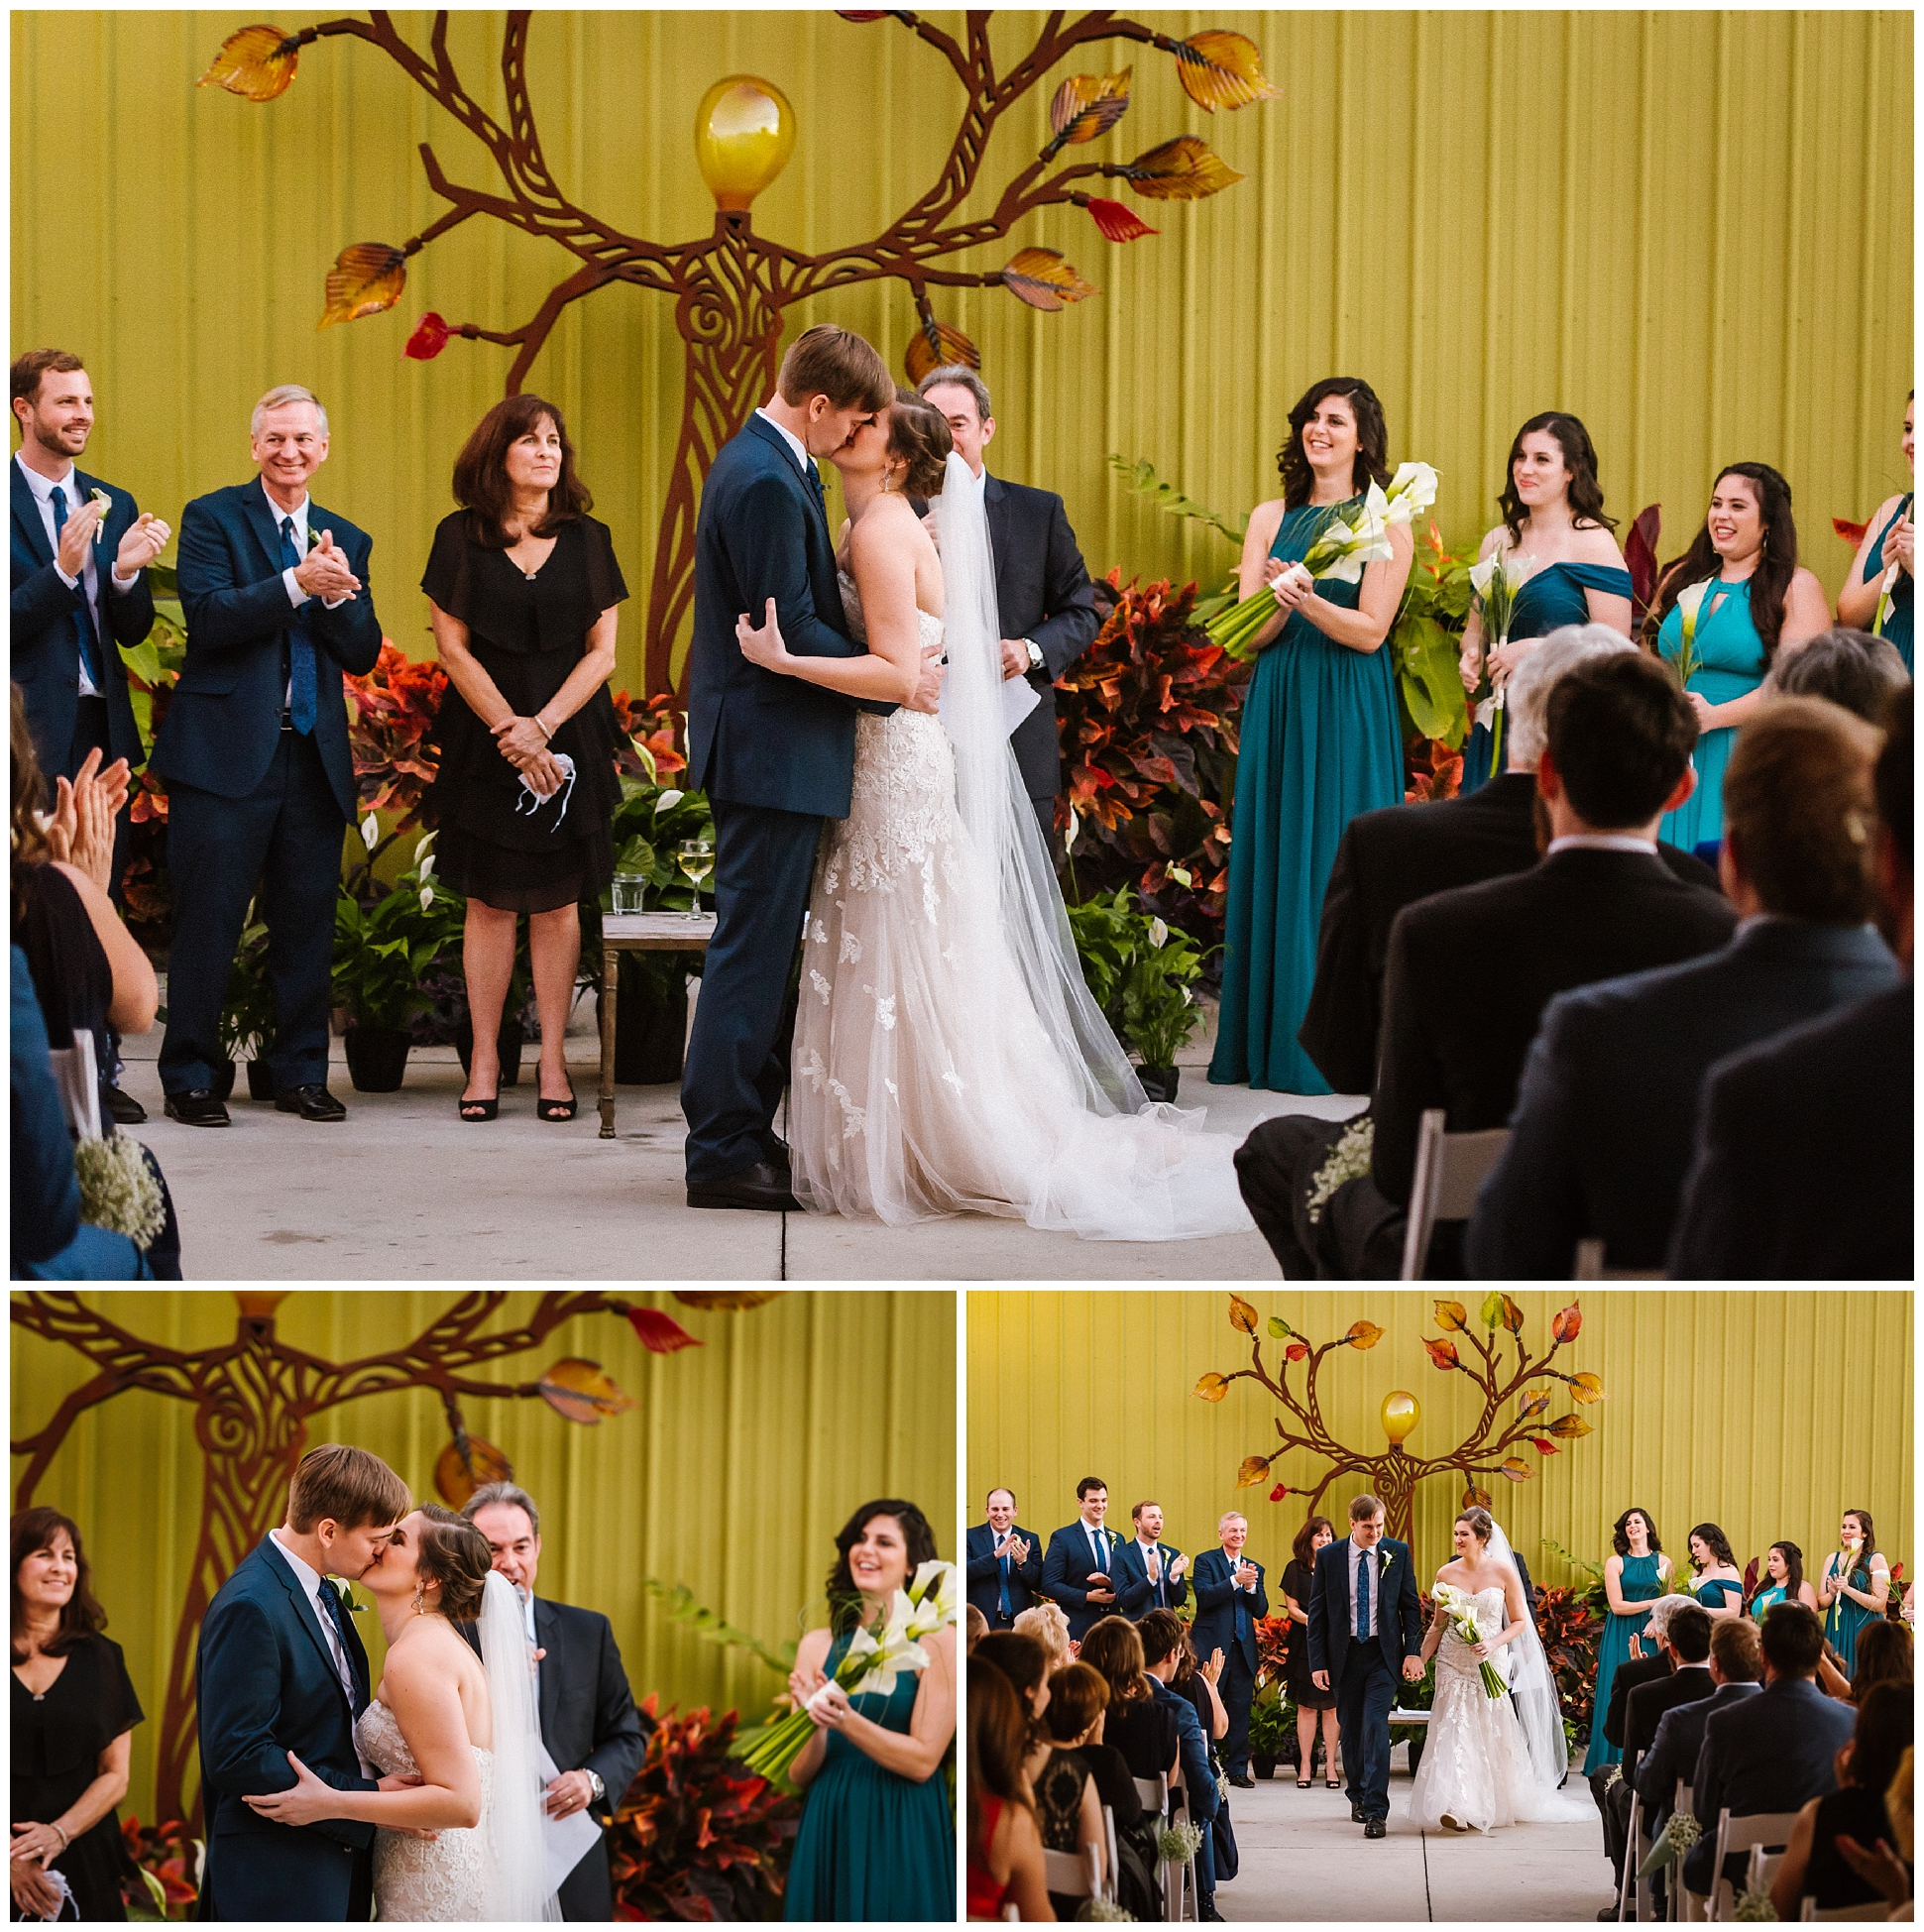 St-pete-wedding-photography-unique-glass-blowing-gallery-succulent-art_0033.jpg